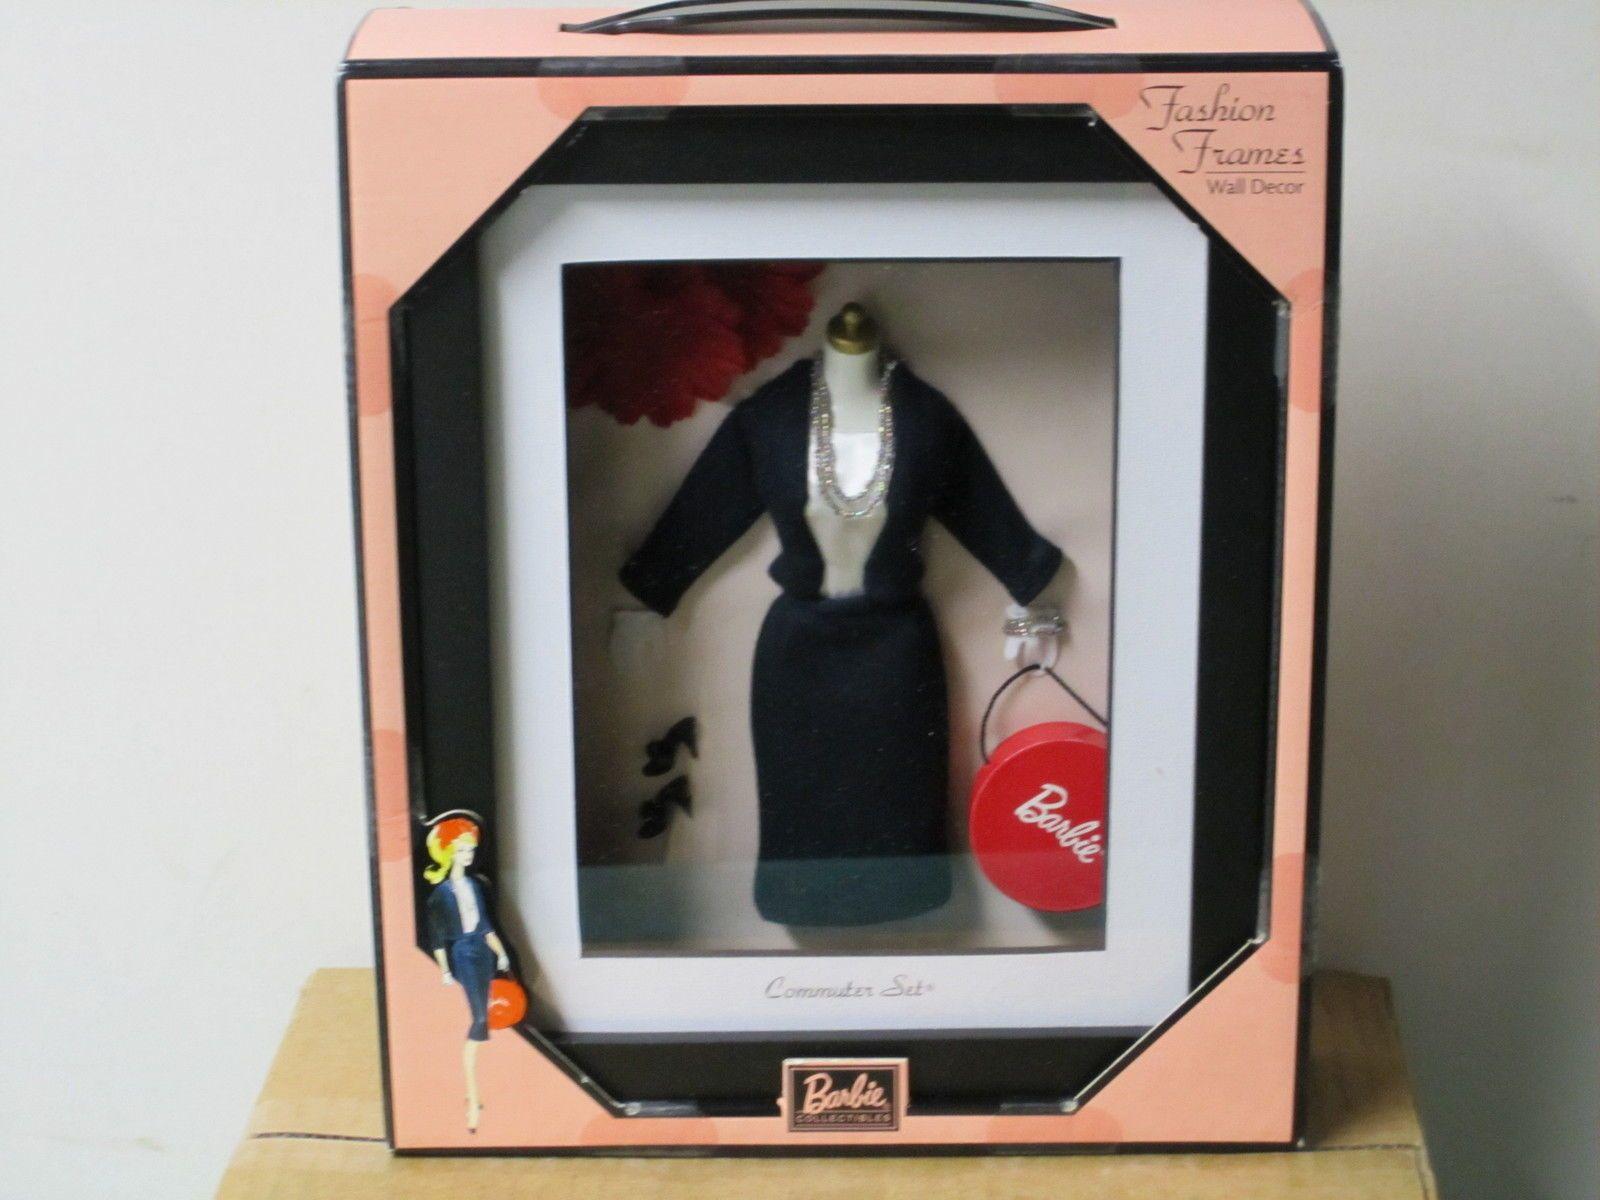 barbie shadow box fashion frames wall decor commuter set ebay - Ebay Picture Frames